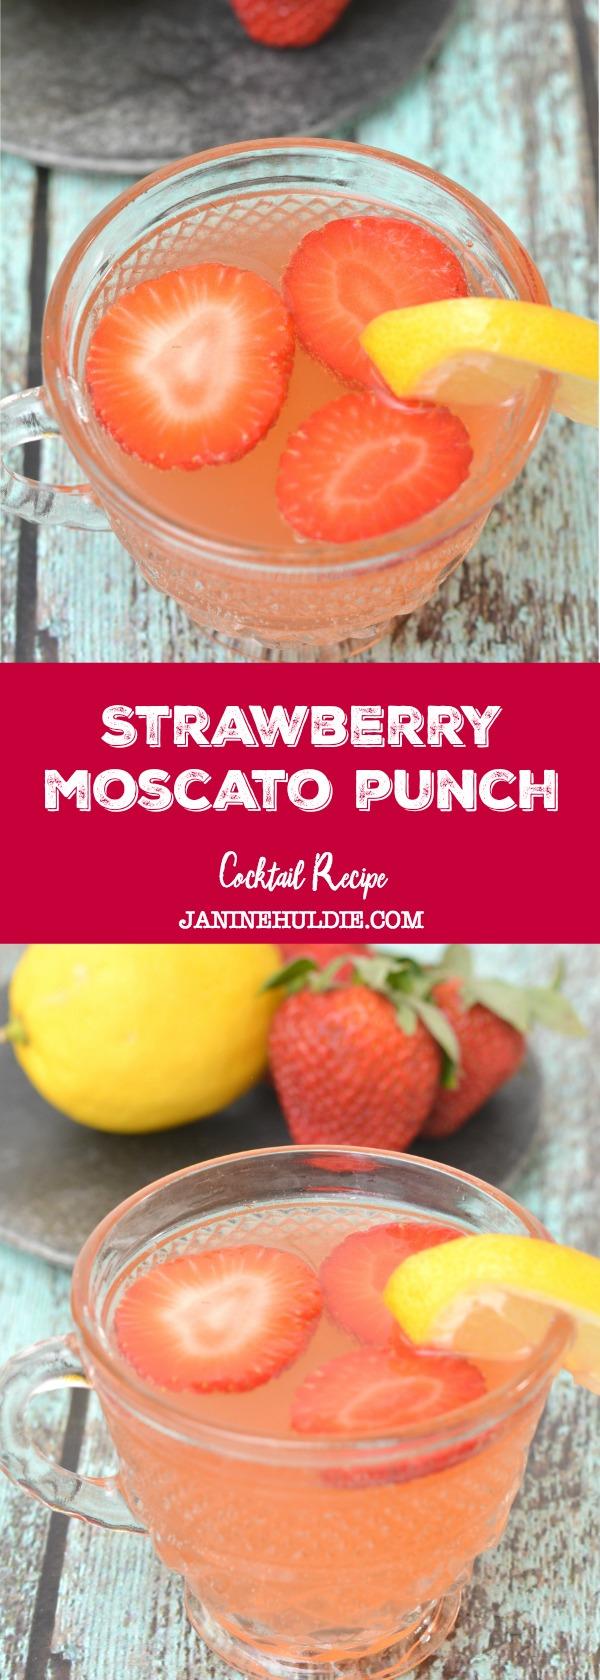 Strawberry Moscato Punch Recipe